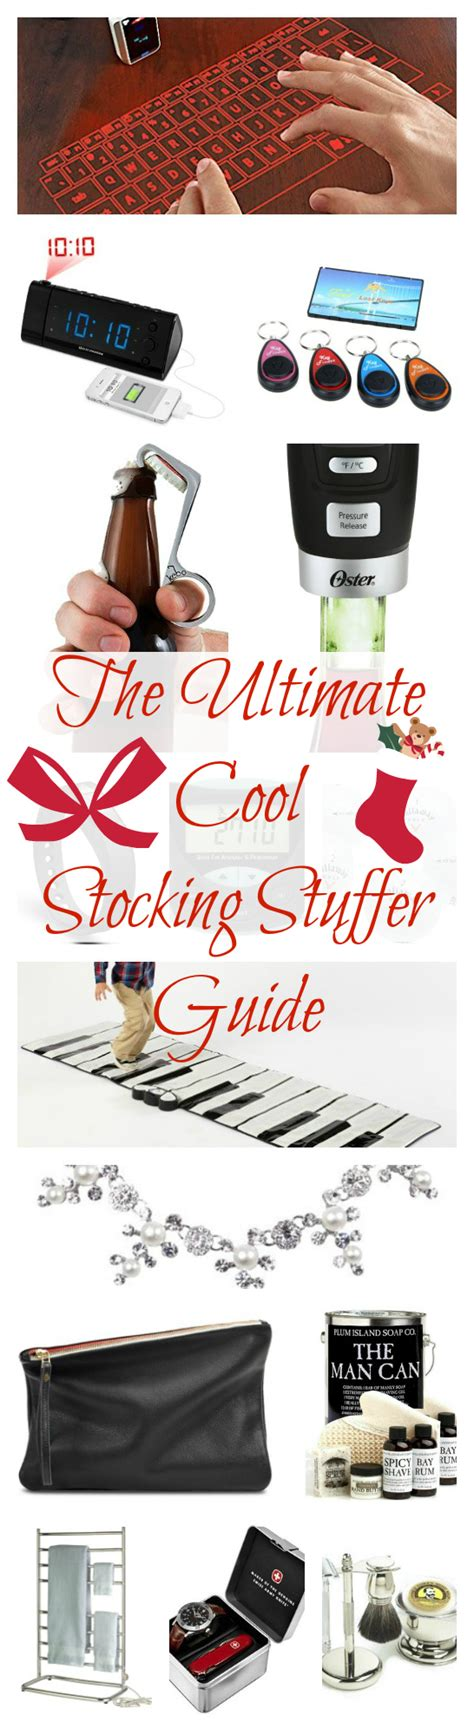 cool stocking stuffers the ultimate cool stocking stuffers dan330